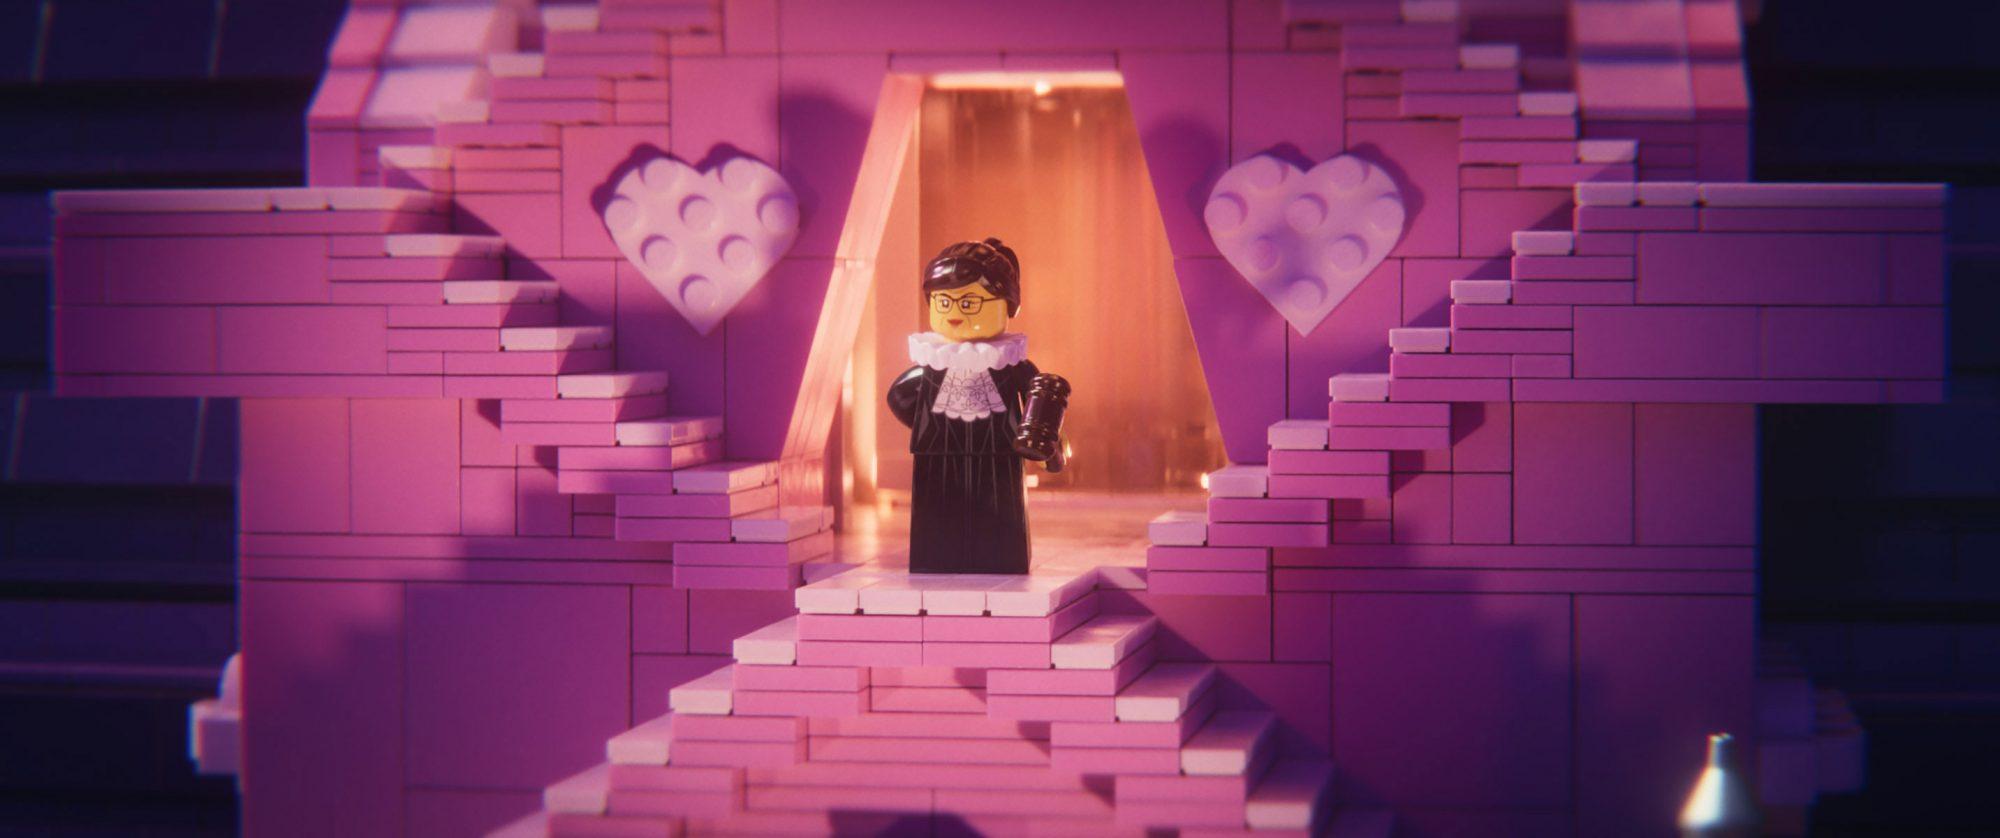 lego-movie-2